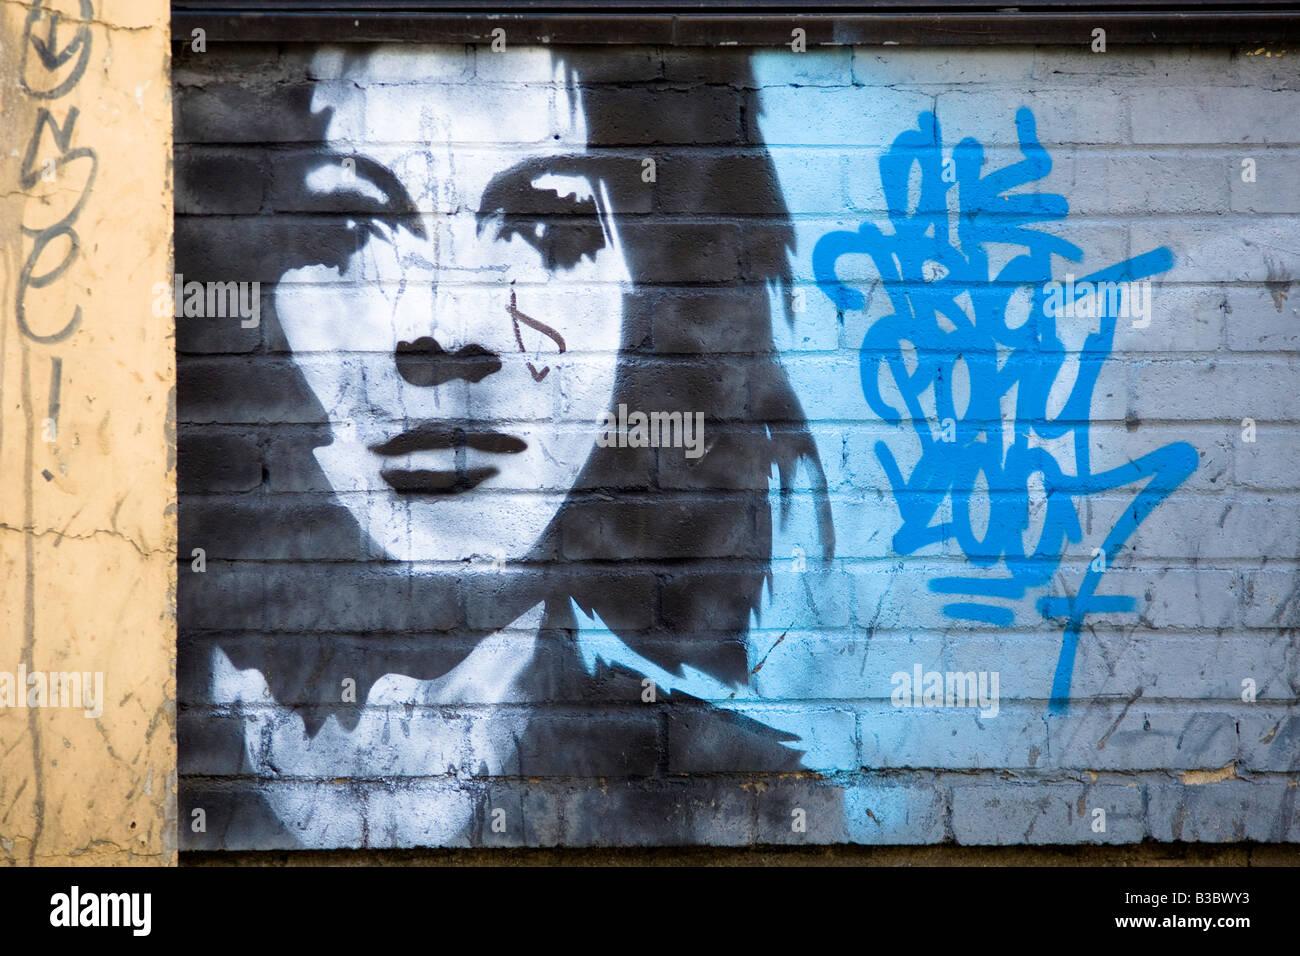 Graffiti stencil of woman's face. Hanbury Street, Tower Hamlets, London, England - Stock Image